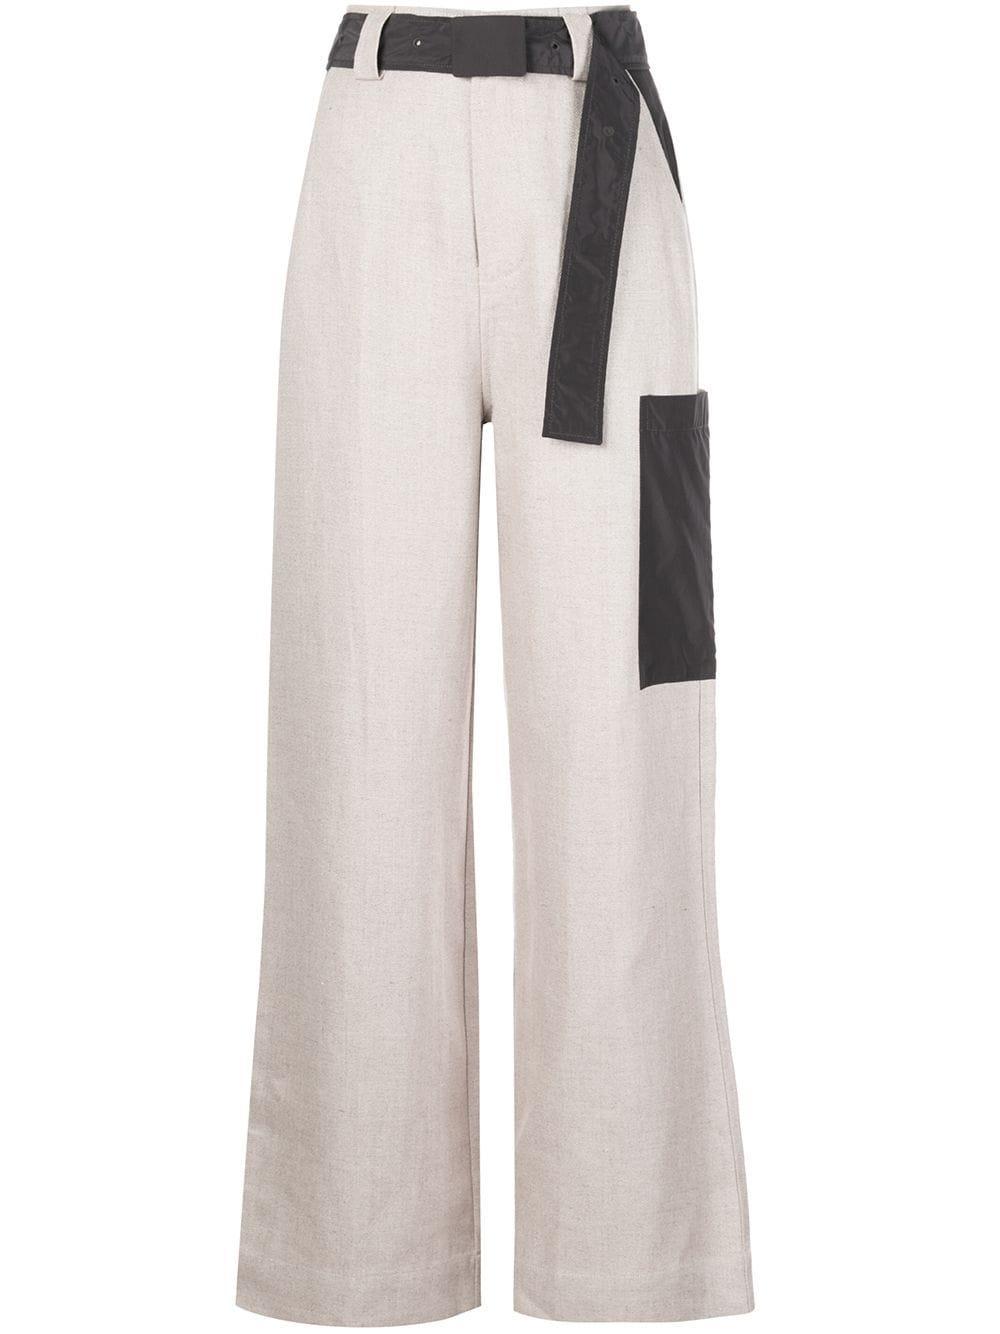 Linen Pant With Belt